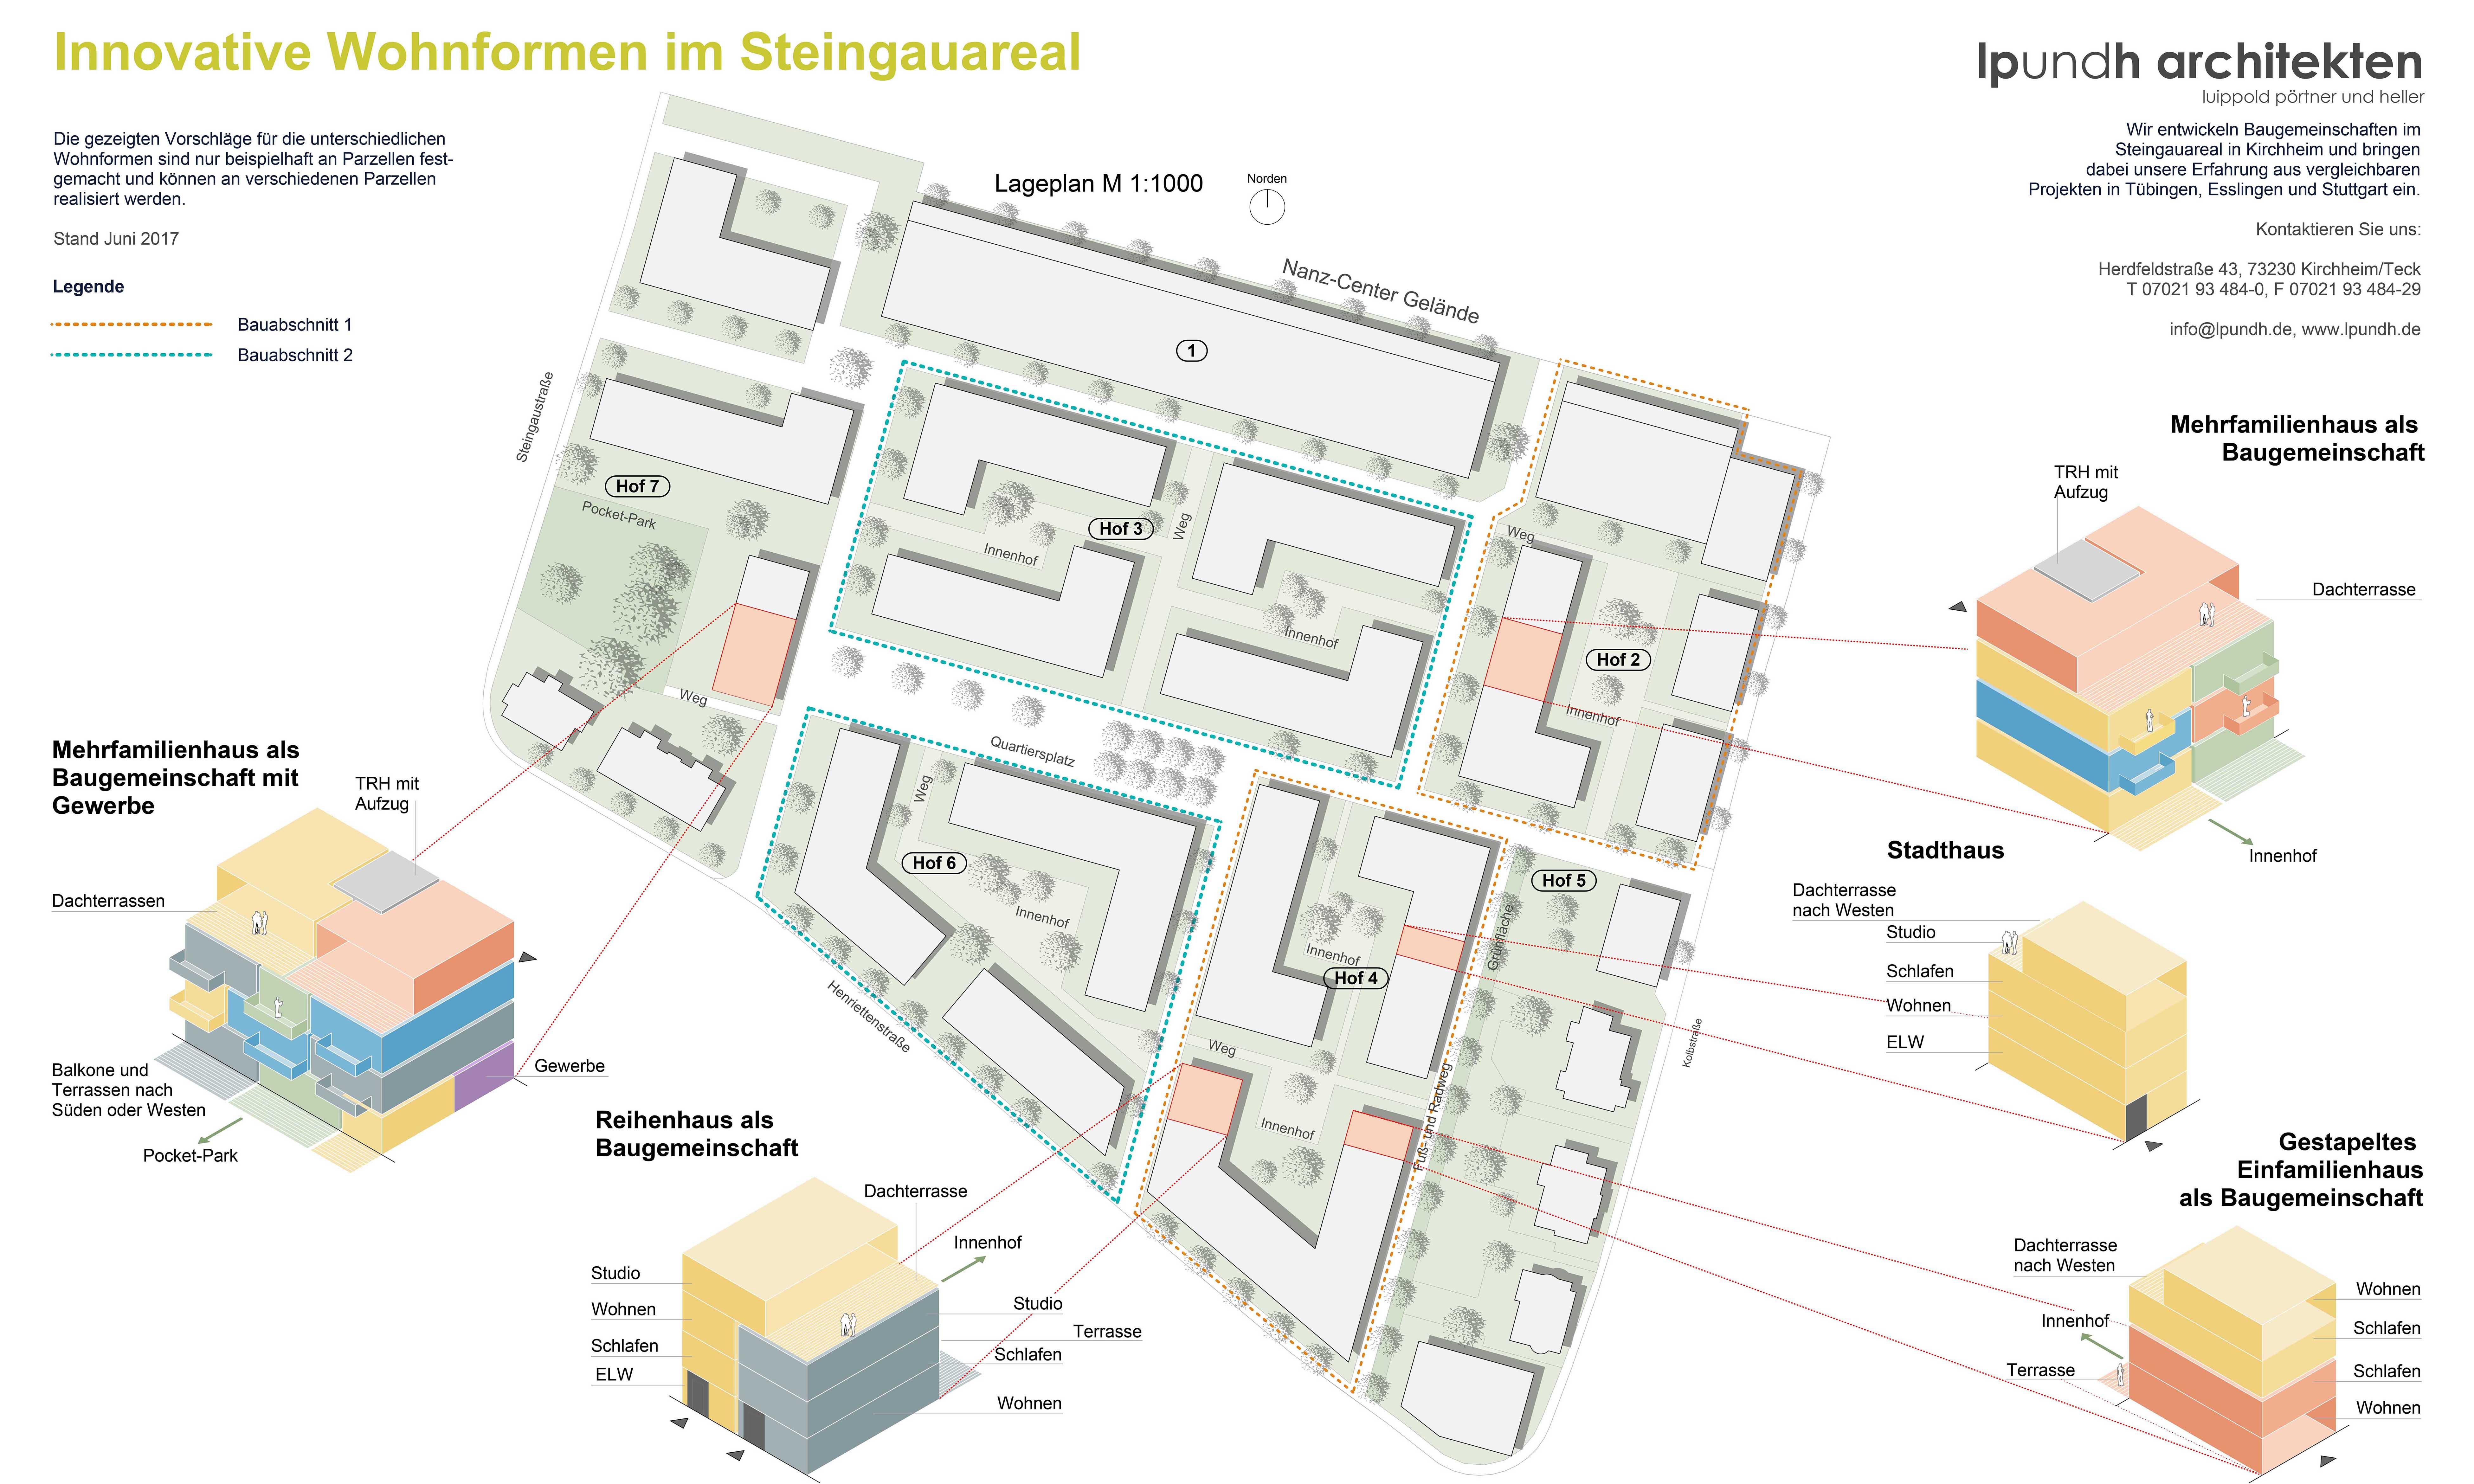 Baugemeinschaften Steingauquartier